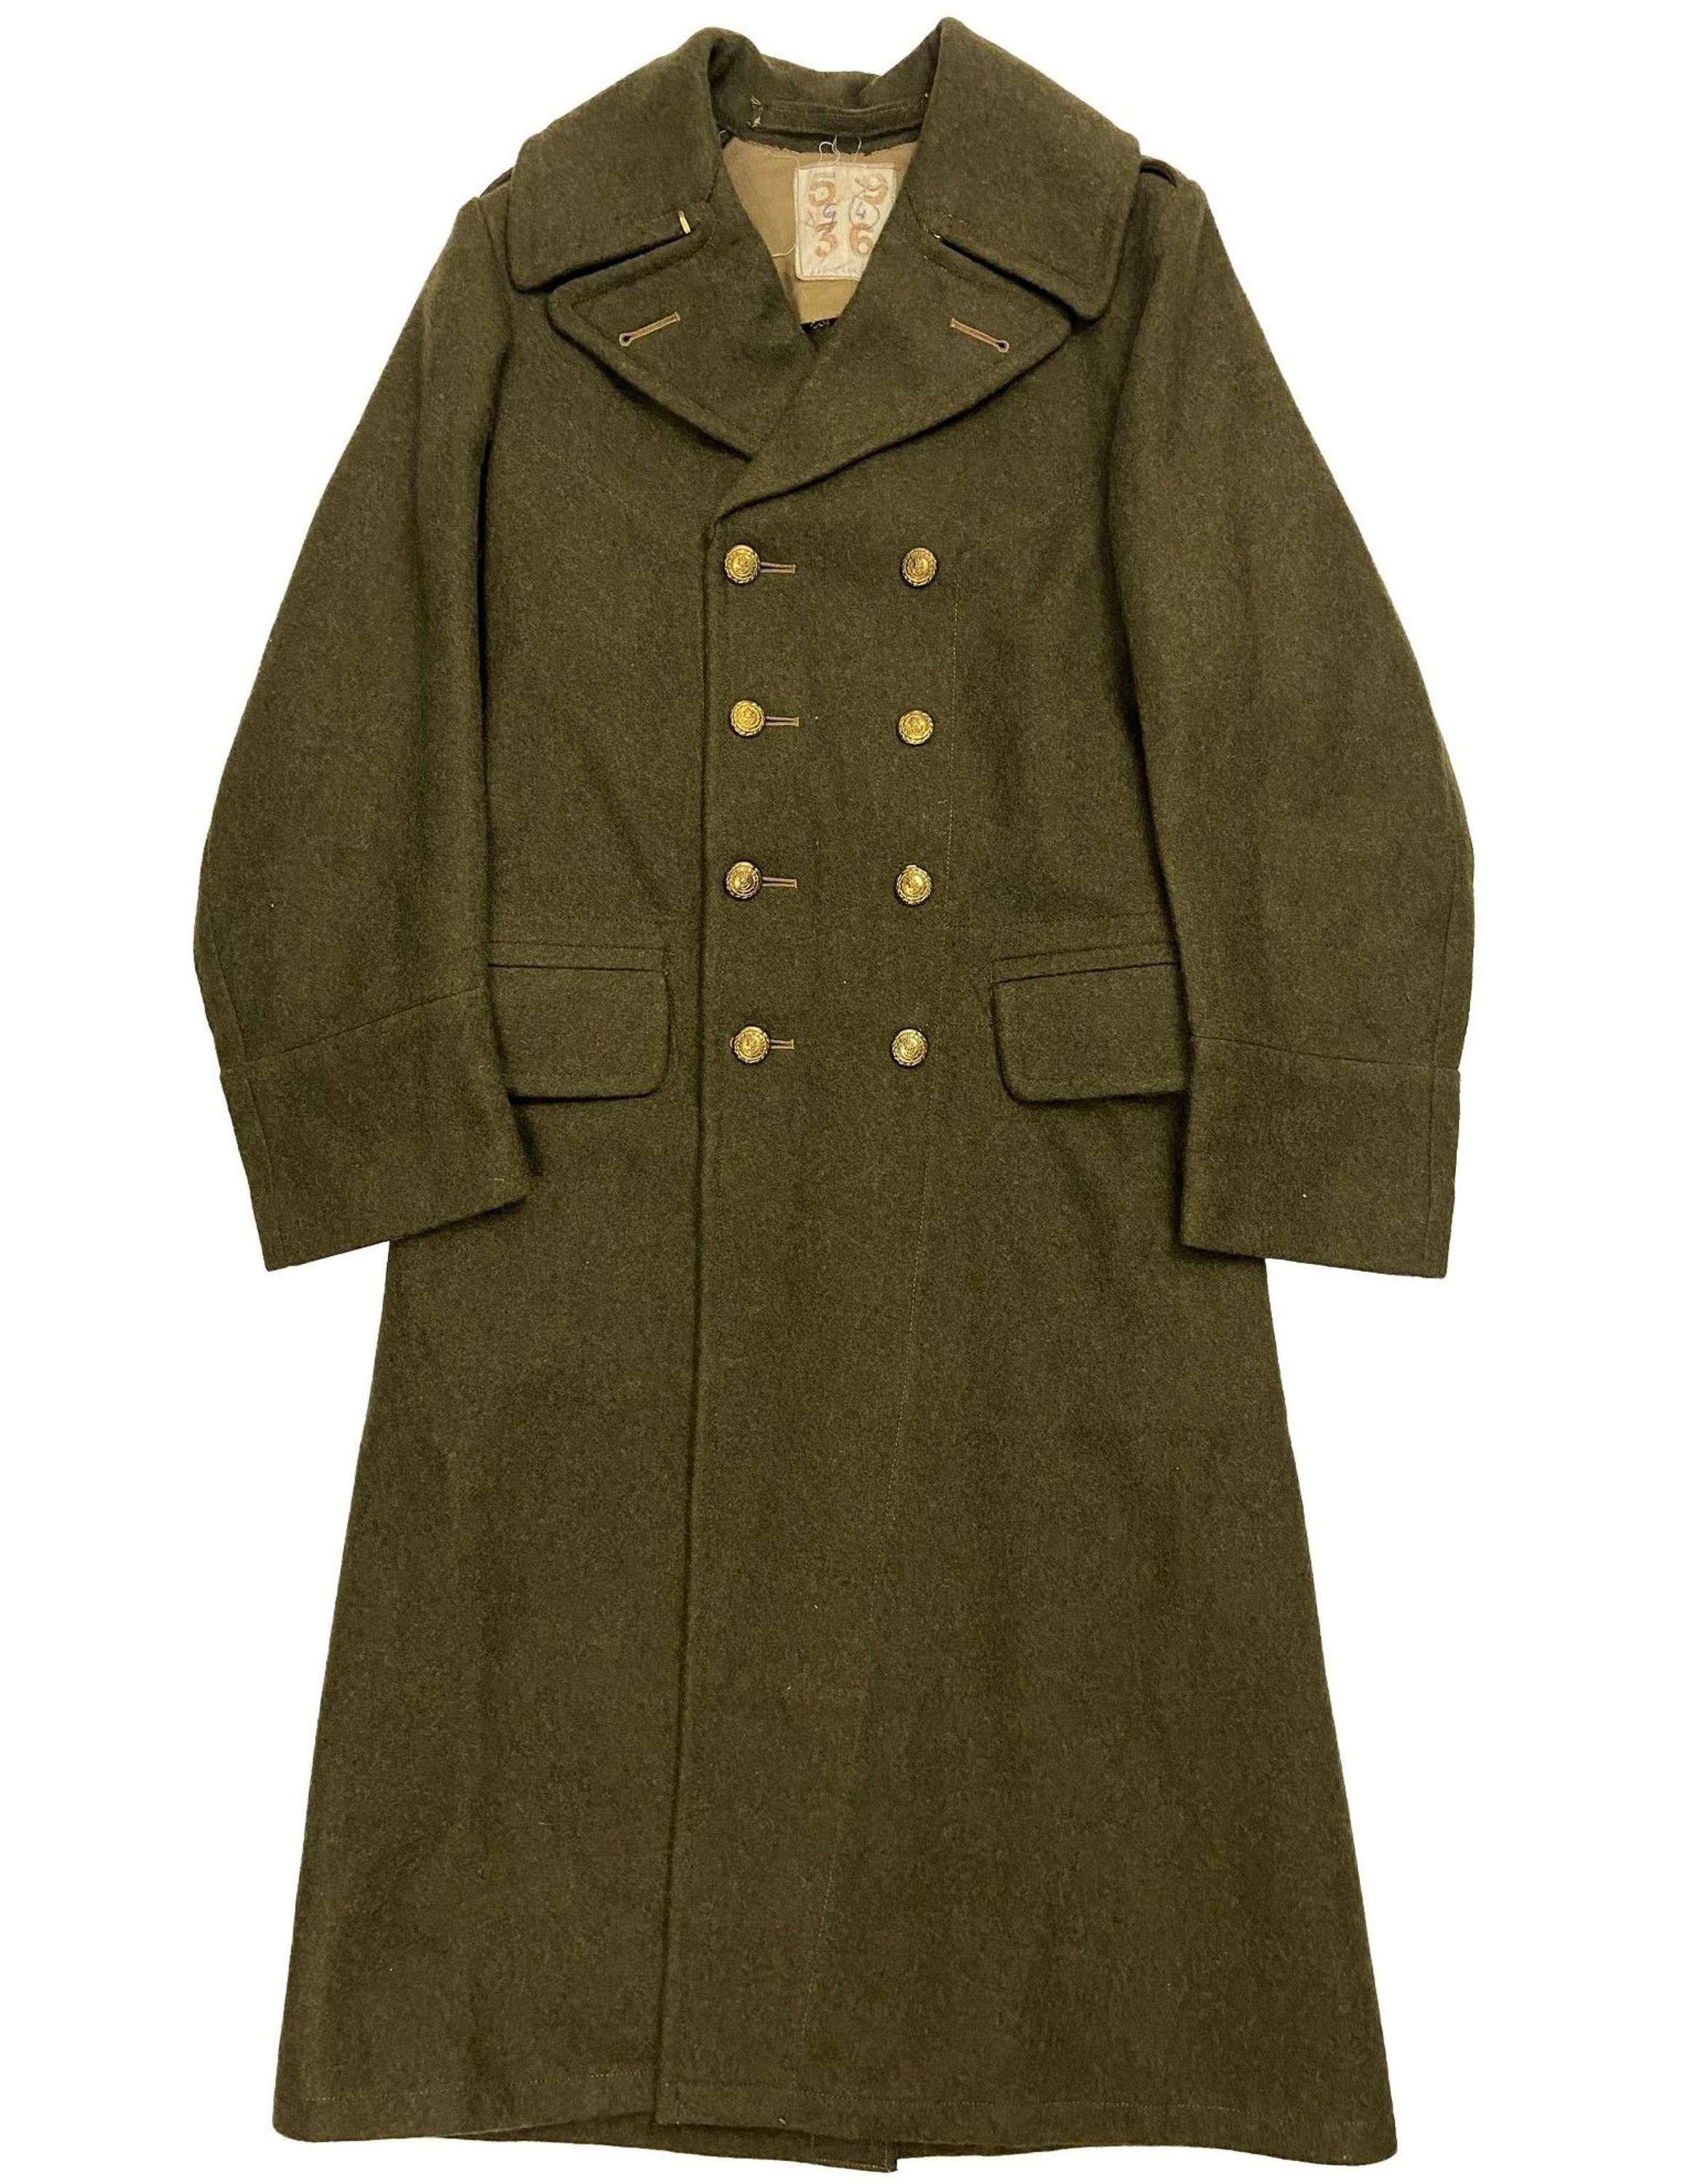 Original WW2 Royal Marines Greatcoat